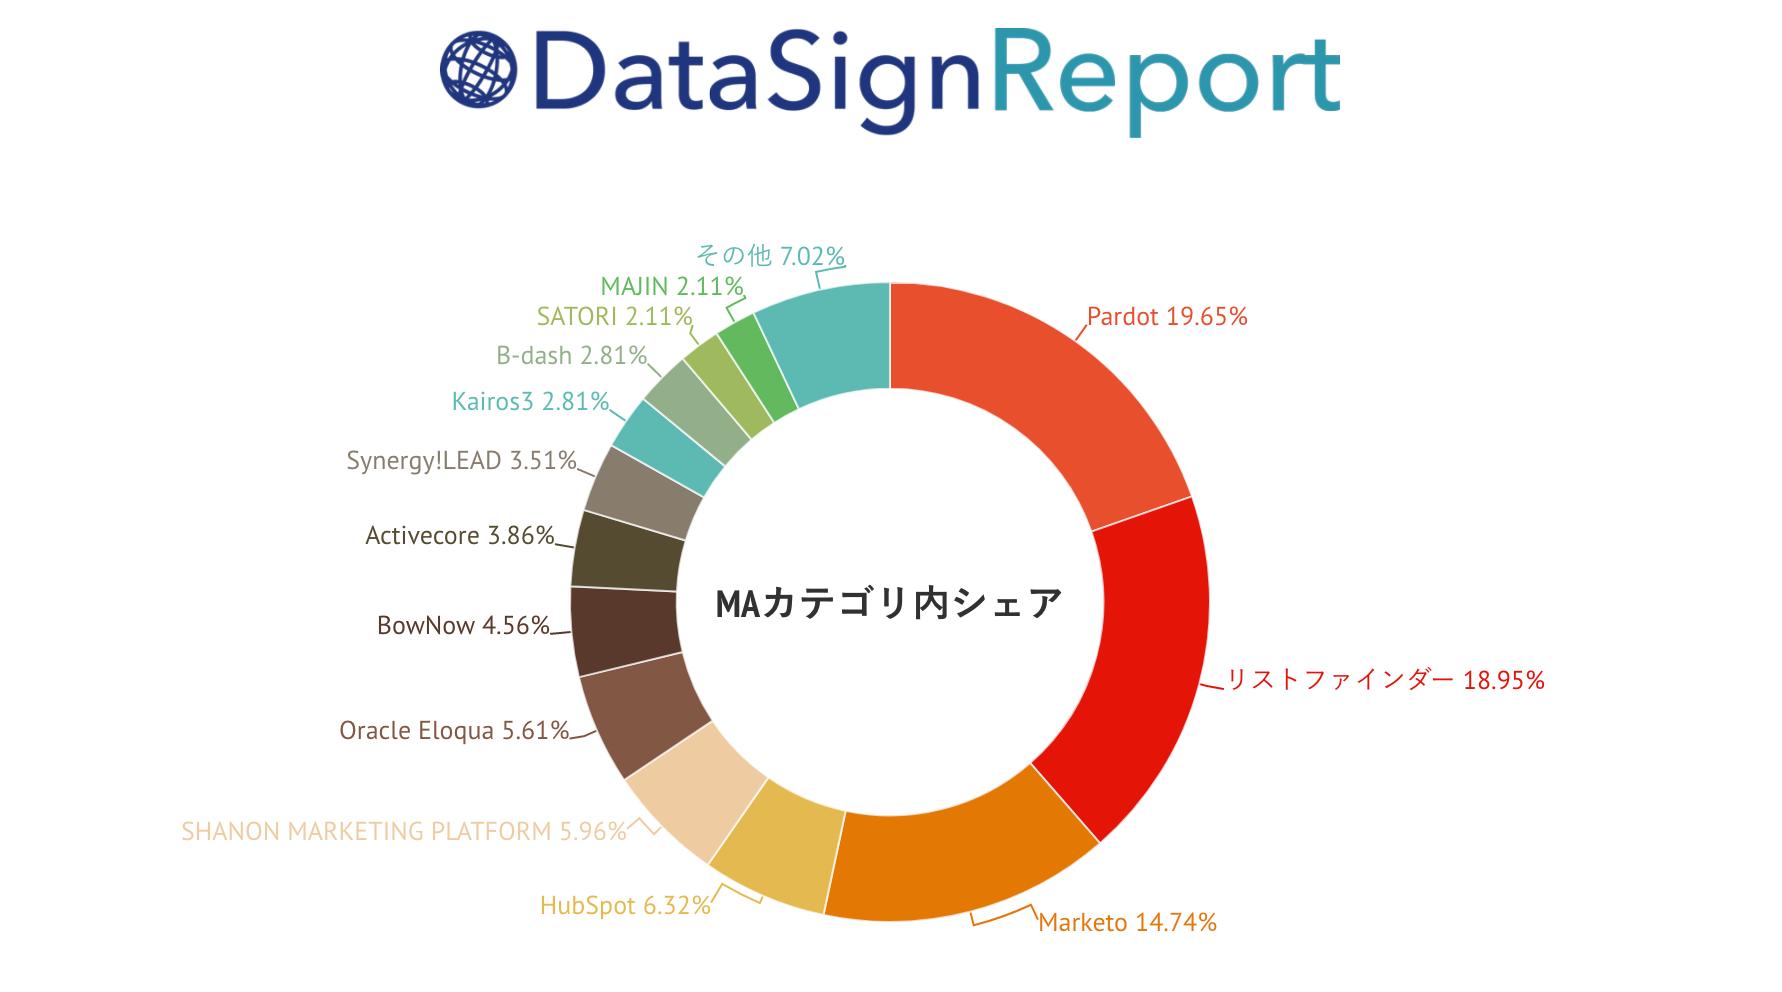 DataSign Report 上場企業調査 2017.11